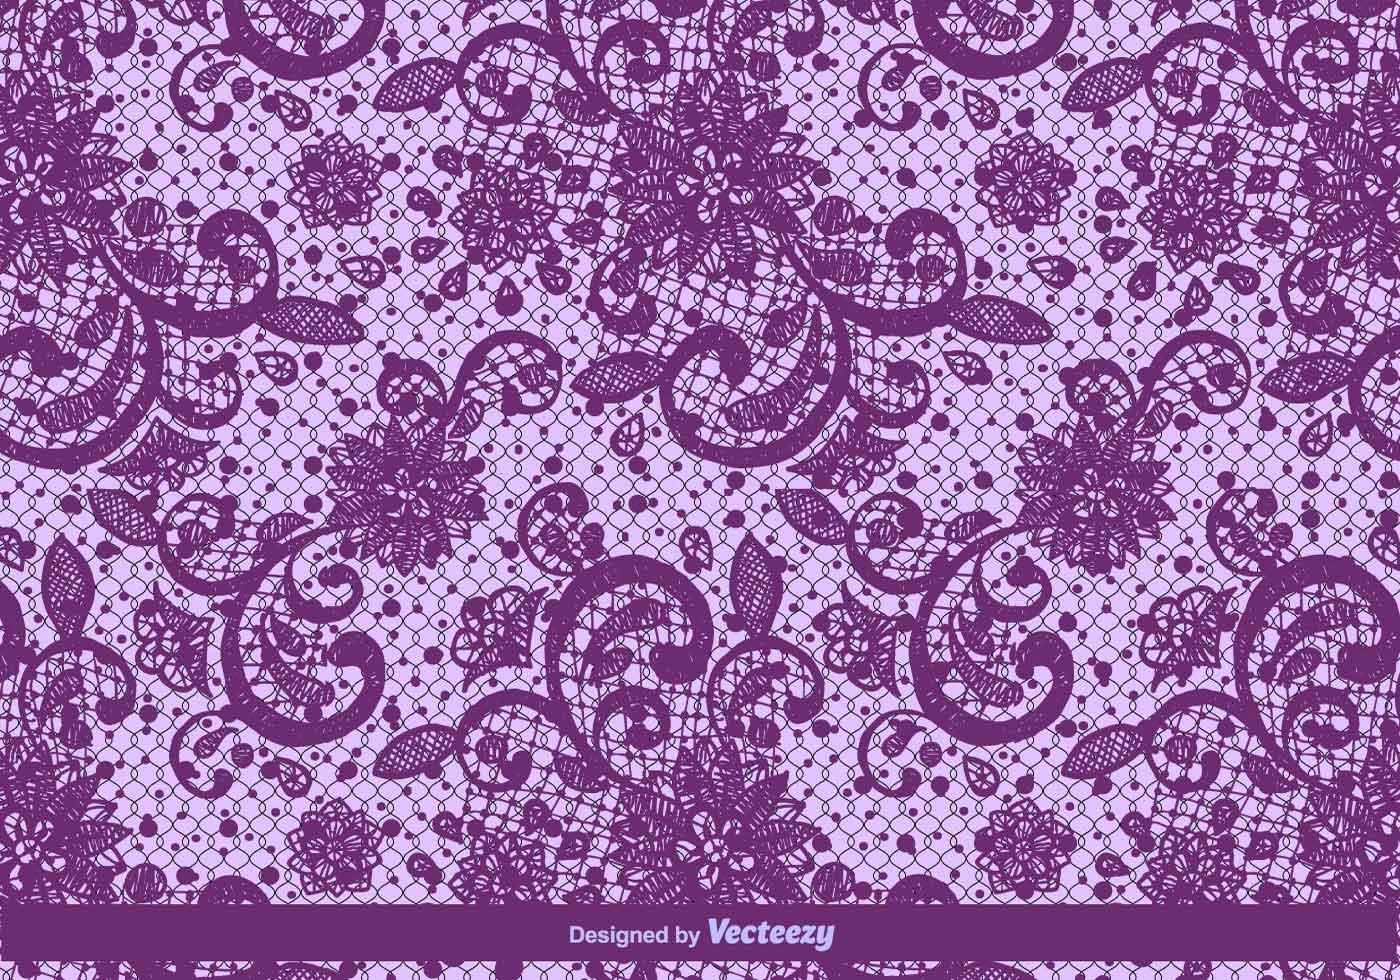 Vector Purple Lace Texture Download Free Vectors Clipart Graphics Vector Art Find the perfect lace texture stock photo. https www vecteezy com vector art 113676 vector purple lace texture